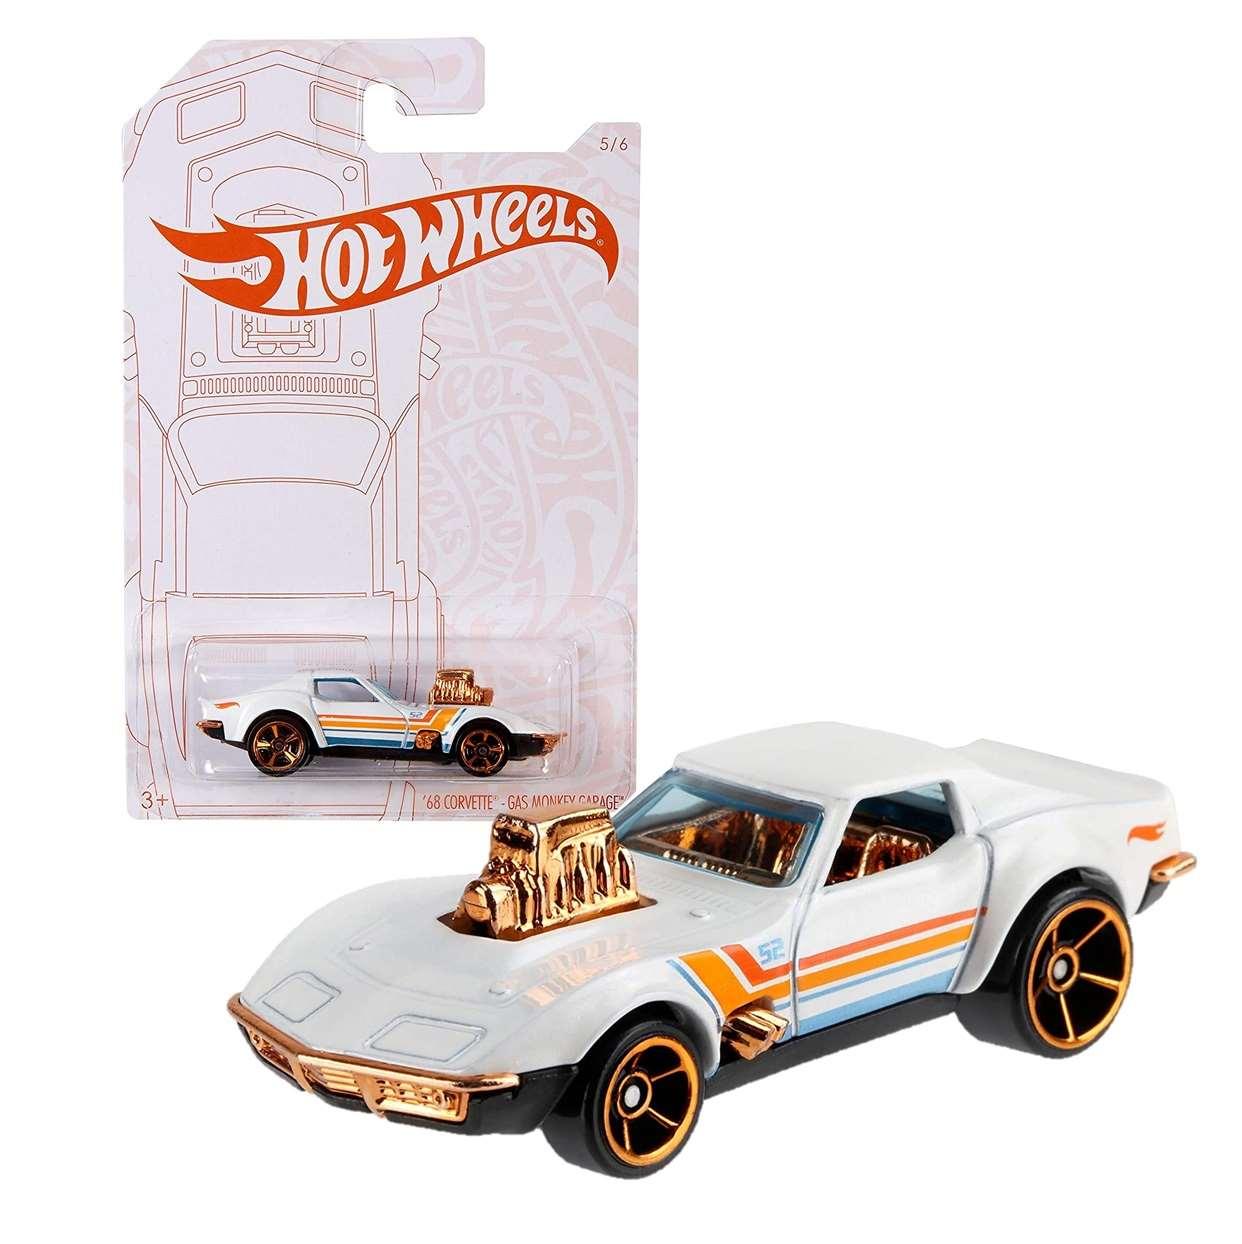 68 Corvette Gas Monkey Garage 5/6 Hot Wheels Gjw52/k910 1l